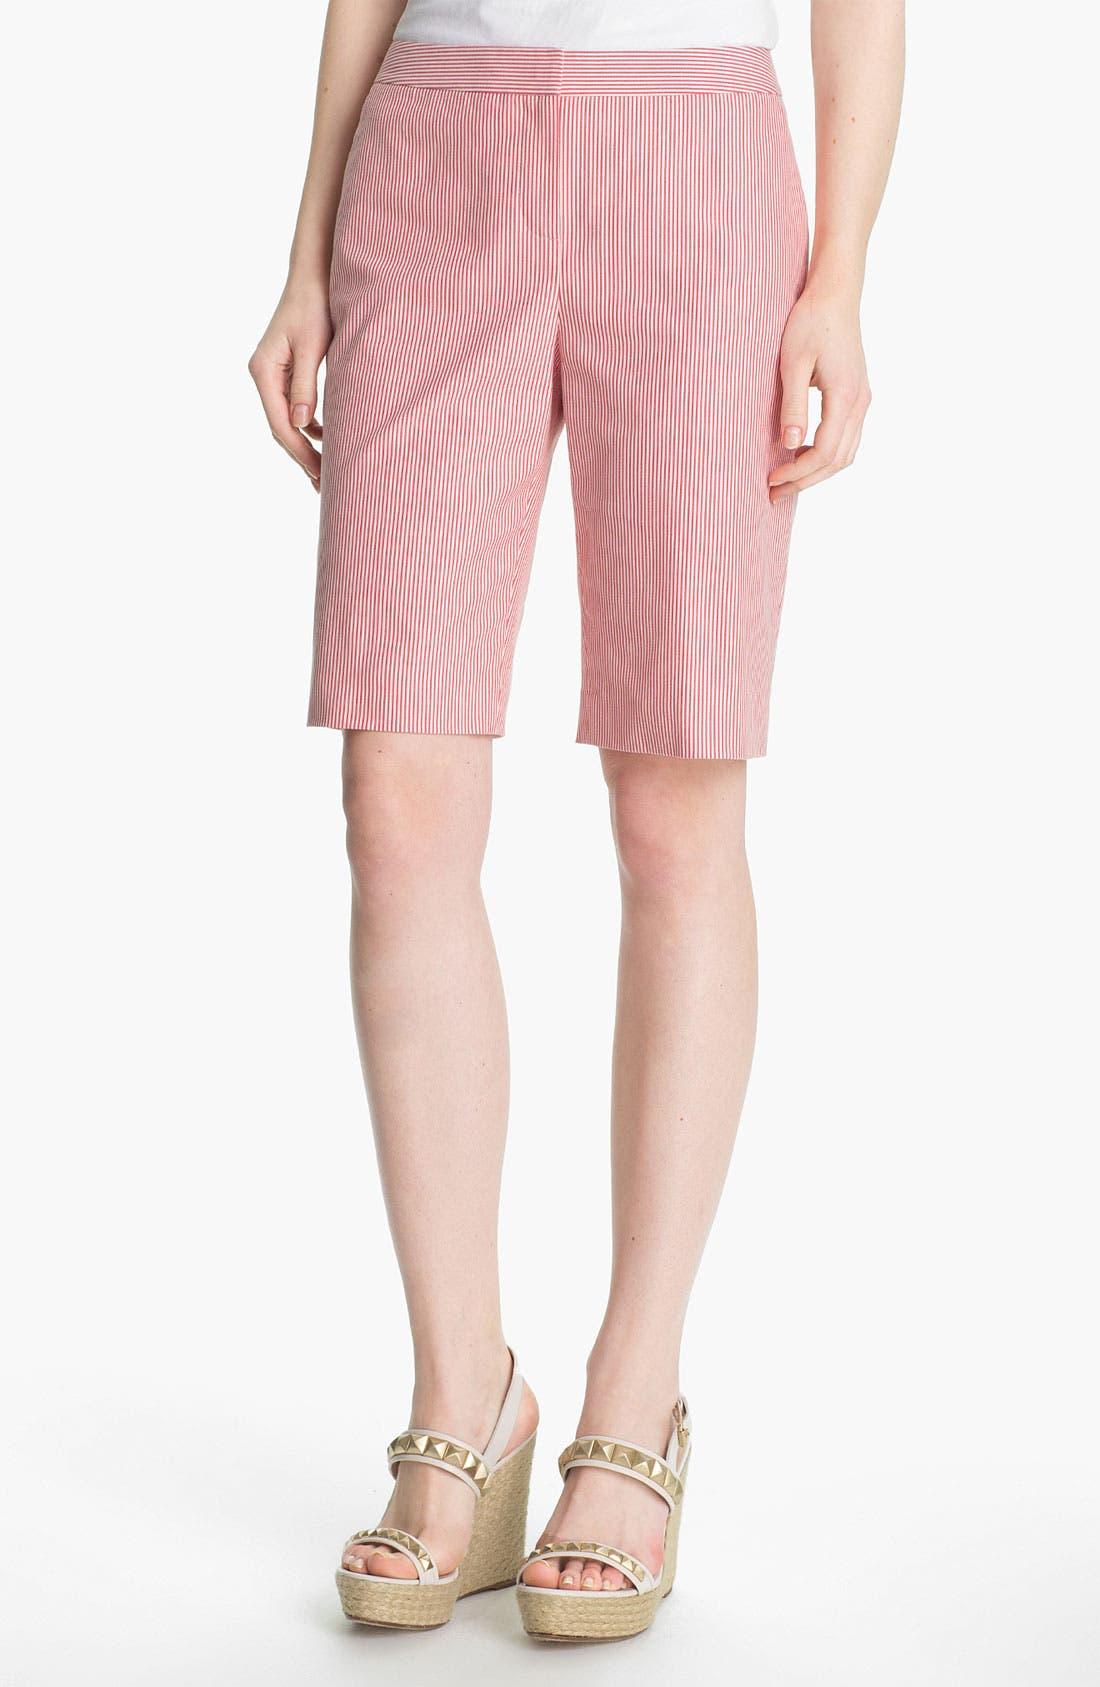 Alternate Image 1 Selected - Halogen® 'Taylor' Curvy Fit Bermuda Shorts